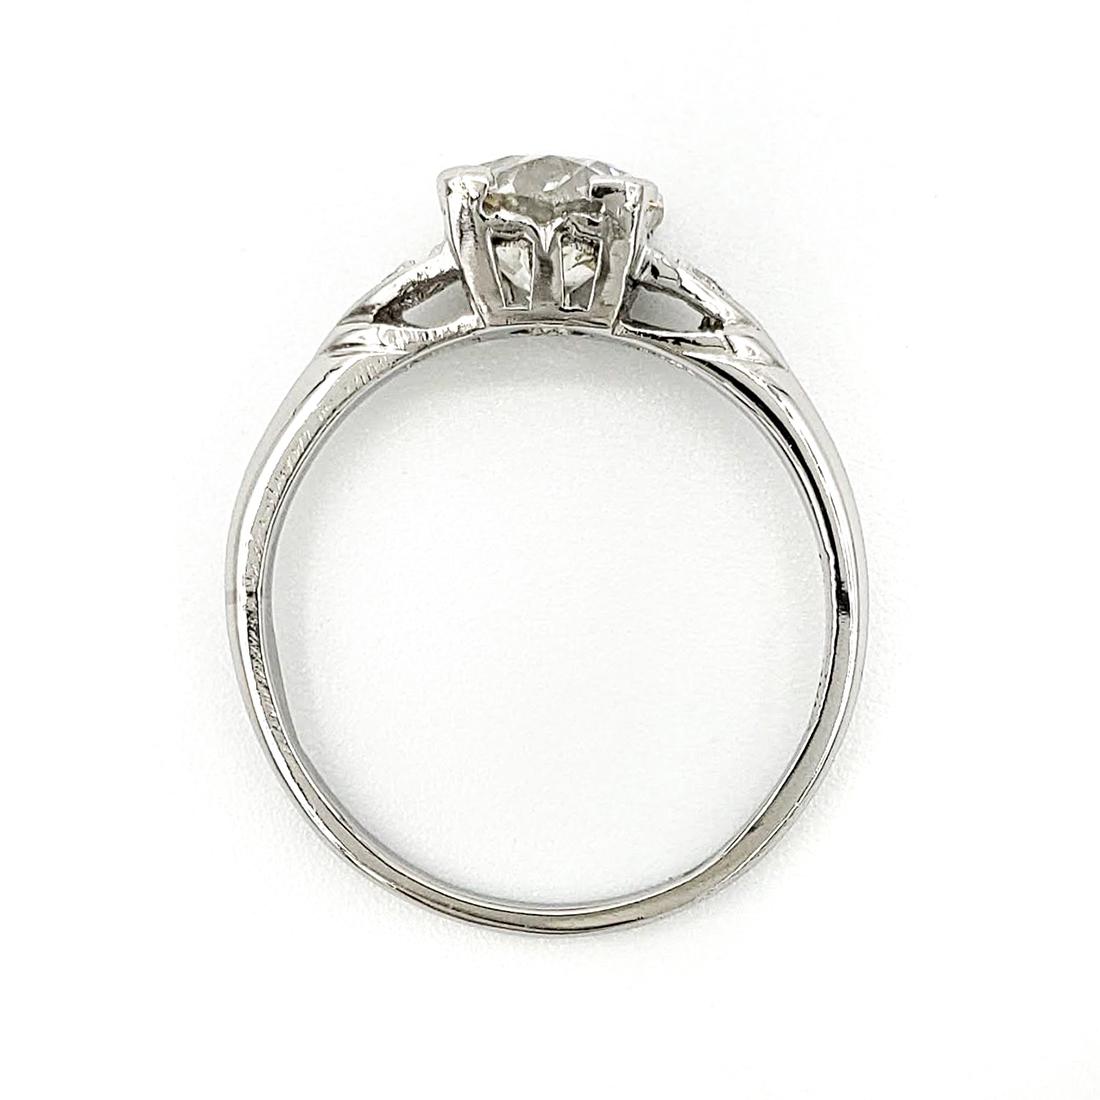 vintage-platinum-engagement-ring-with-1-11-carat-old-european-cut-diamond-egl-i-vs2